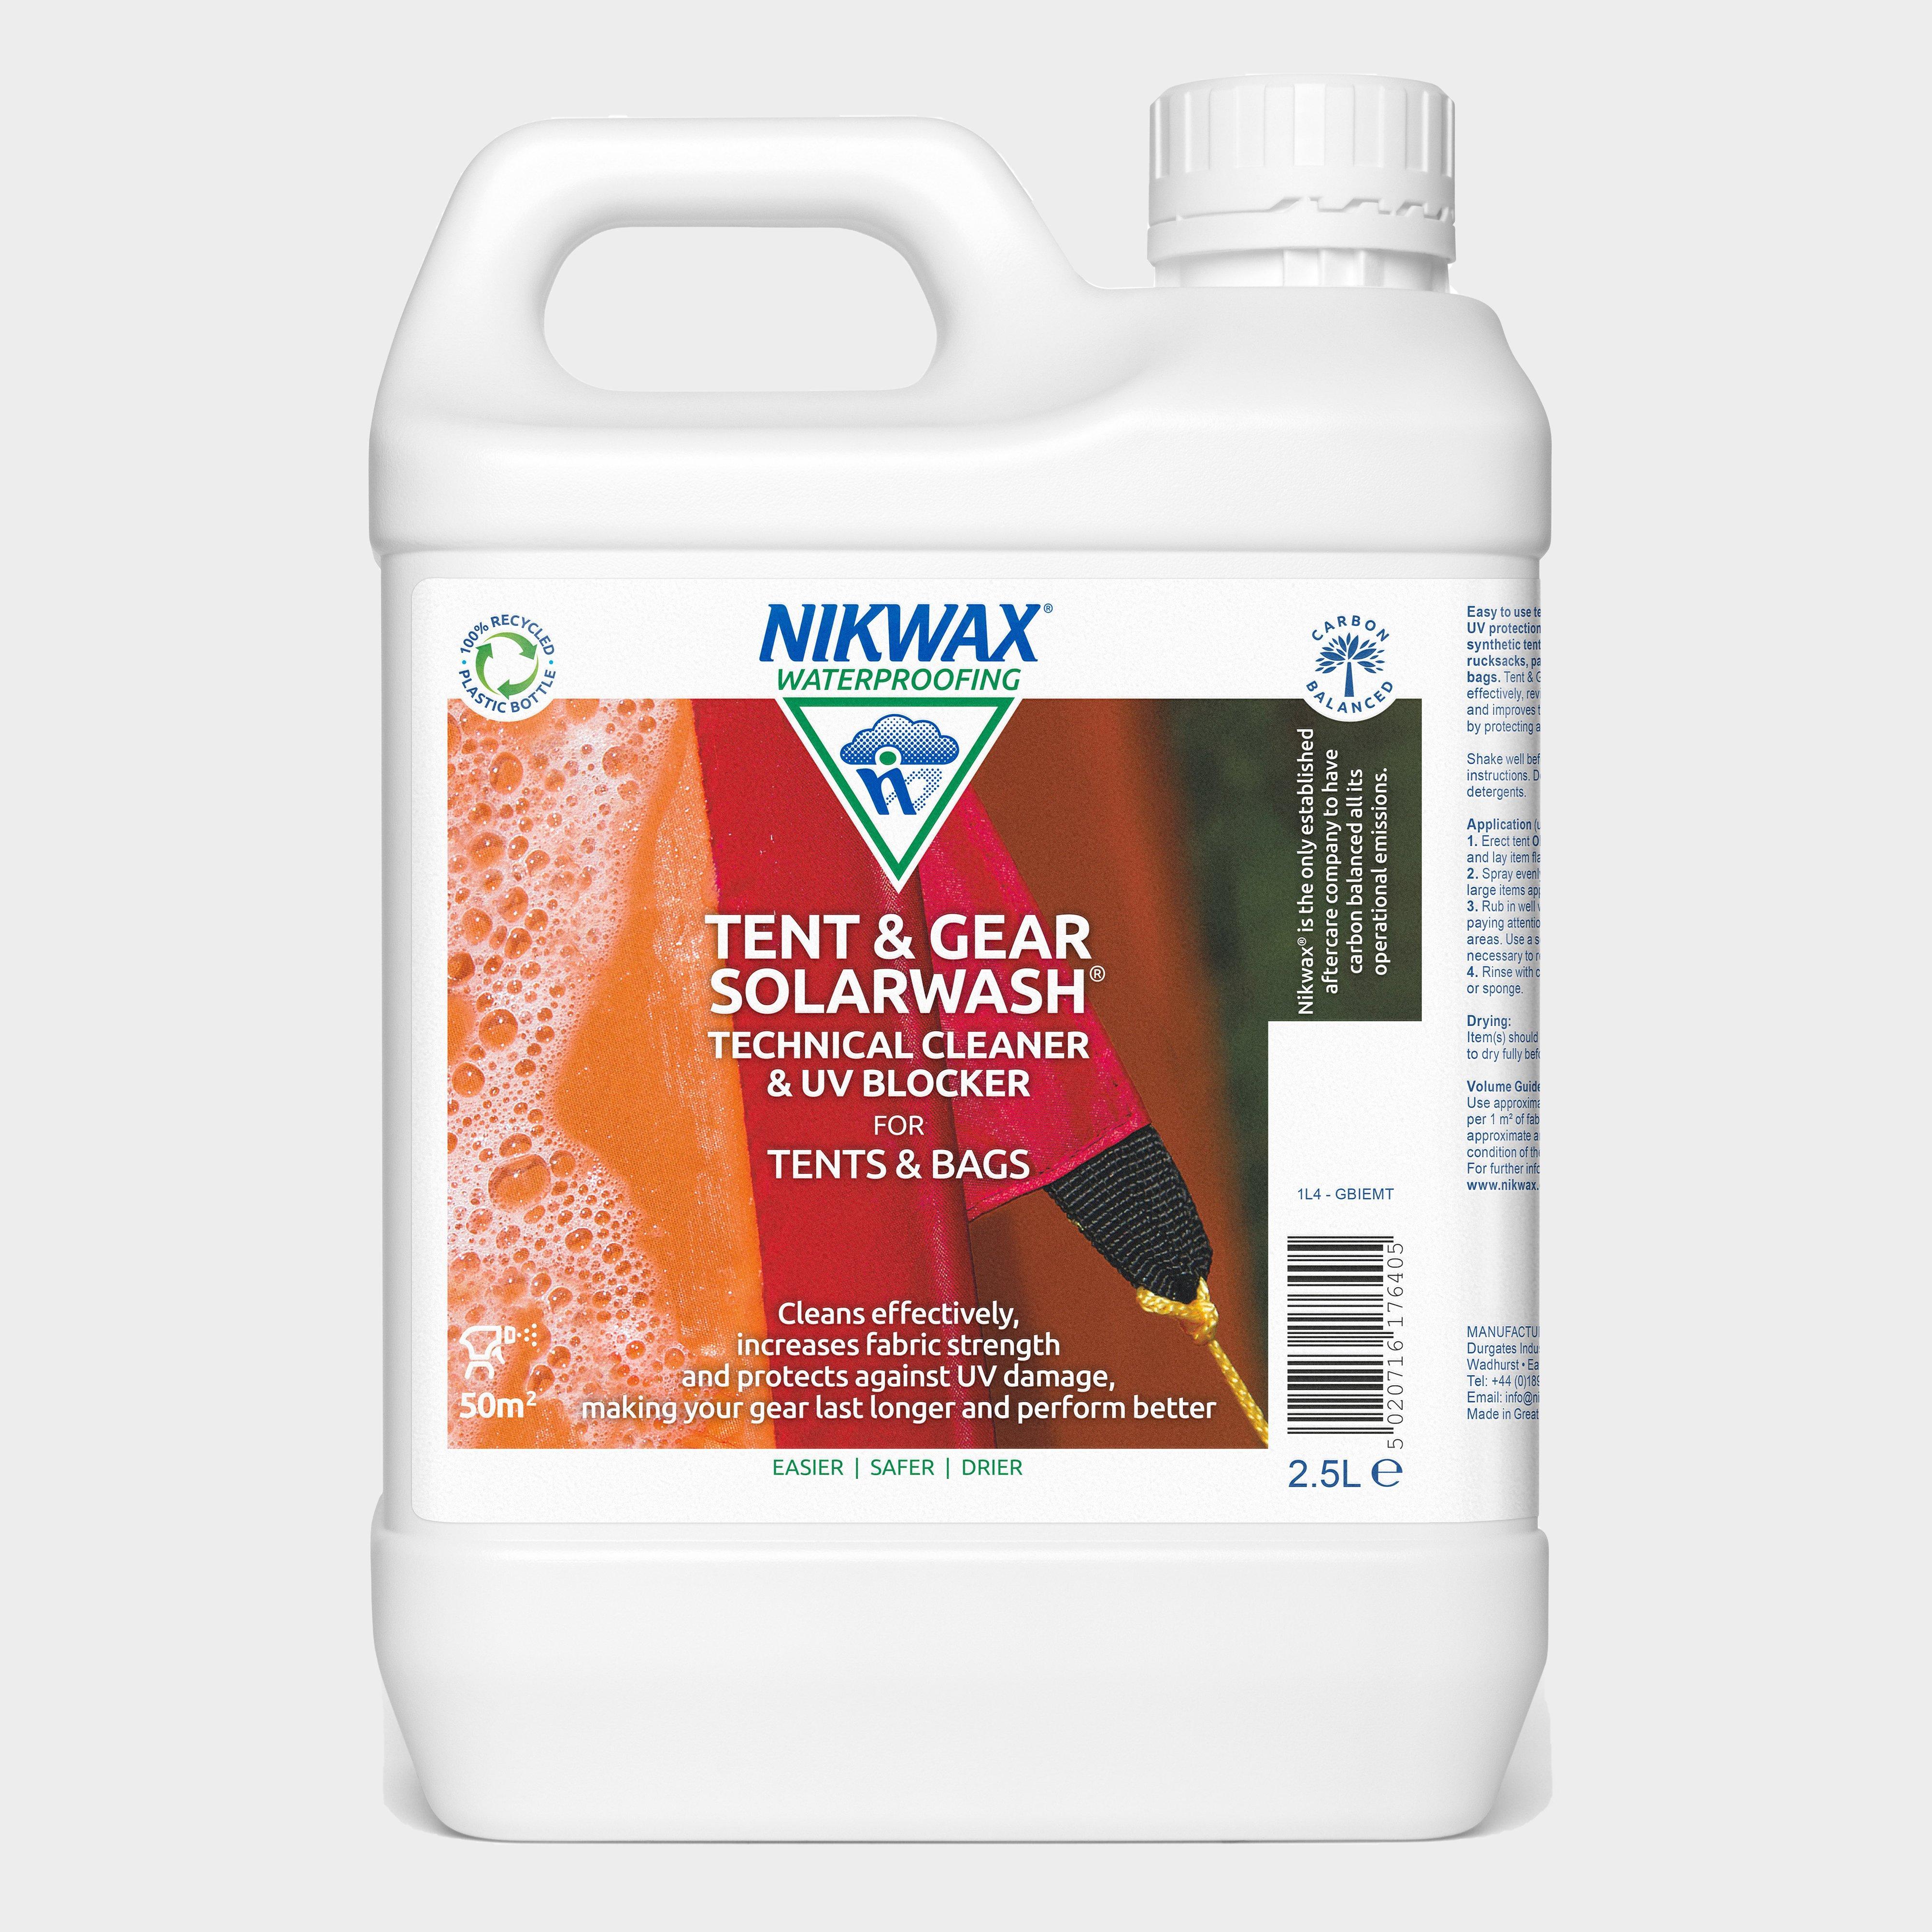 Image of Nikwax Tent & Gear Solarwash 2.5L - White/Litre, White/LITRE